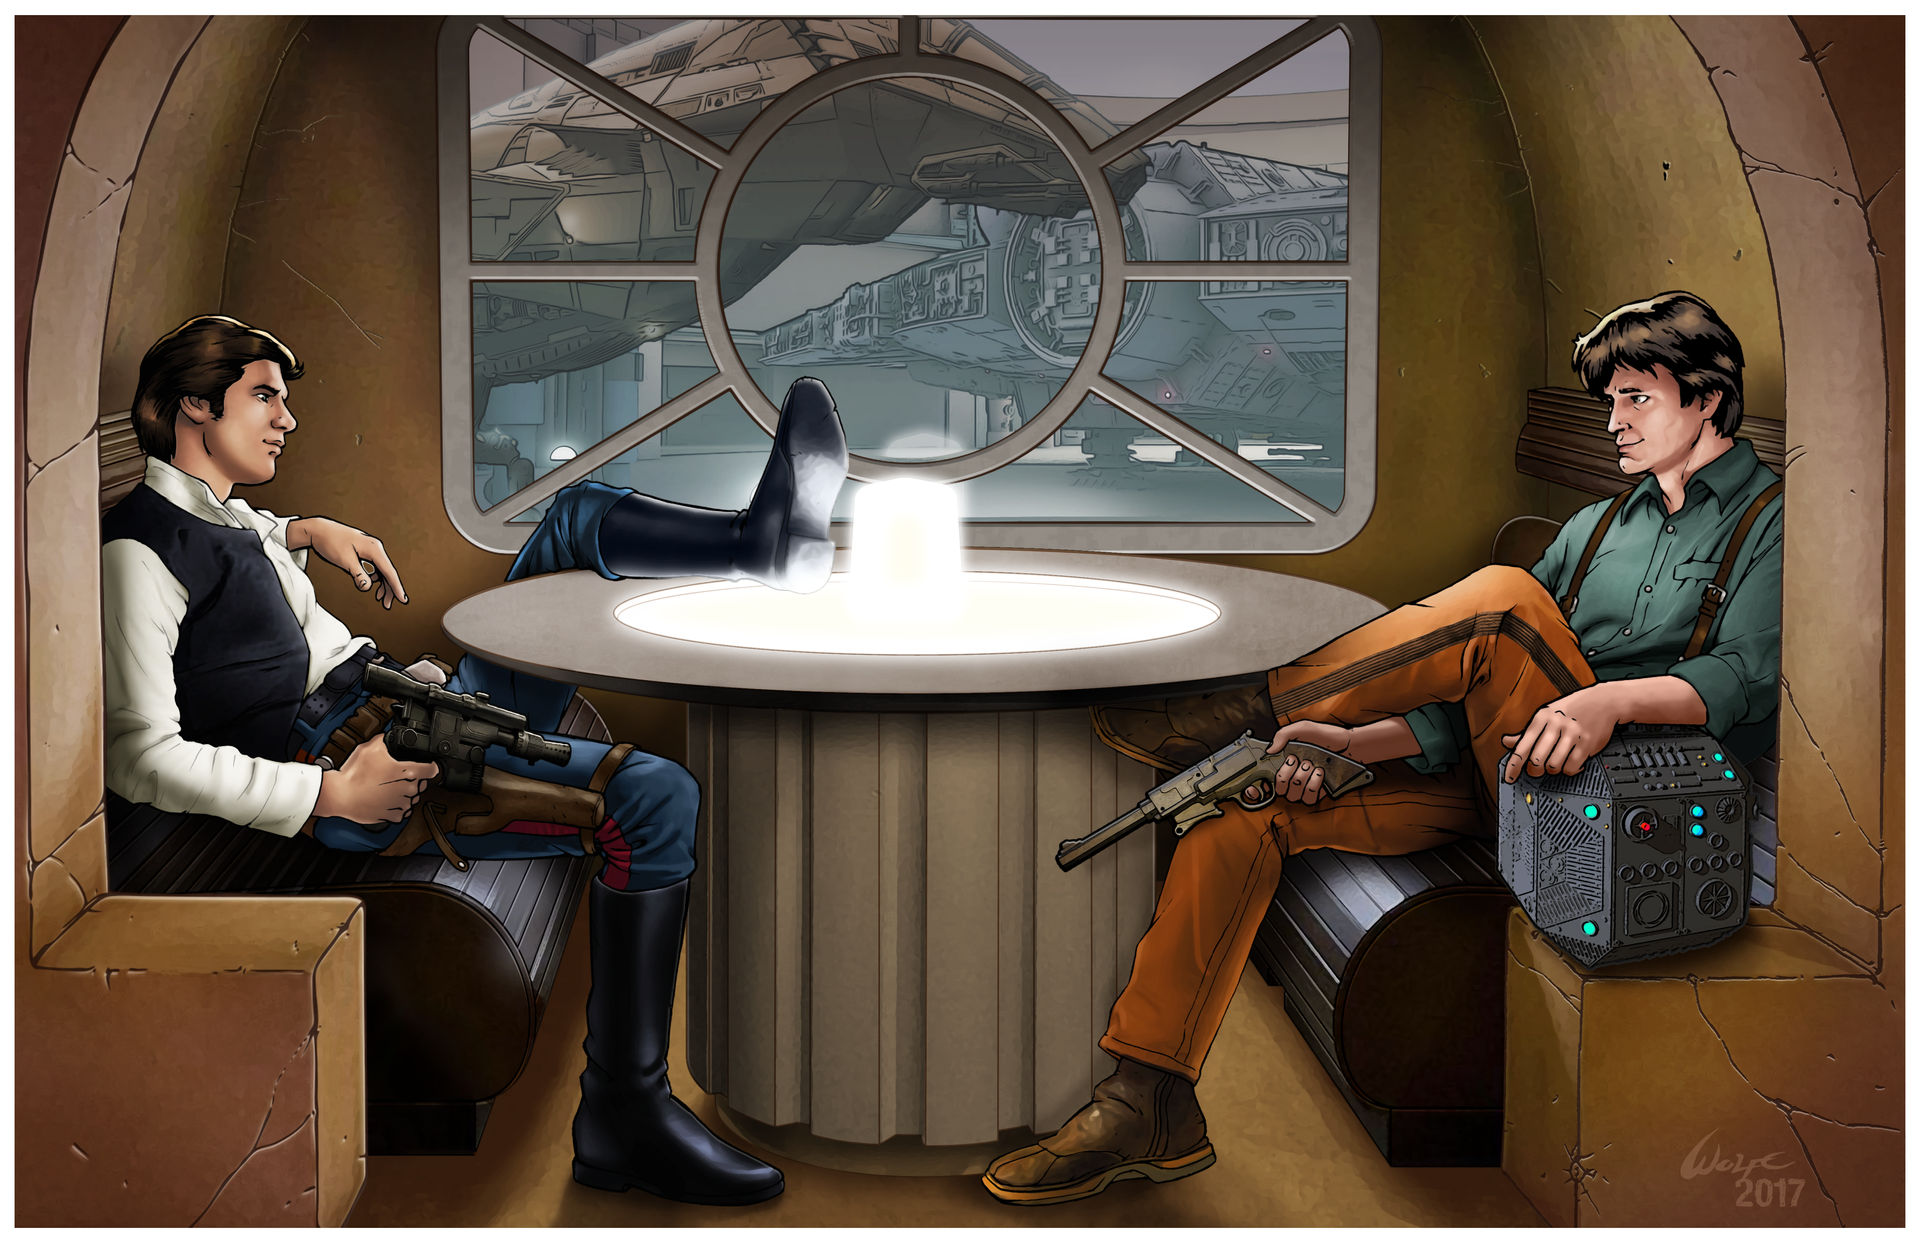 Star Wars/Firefly mashup: The Loot Dispute